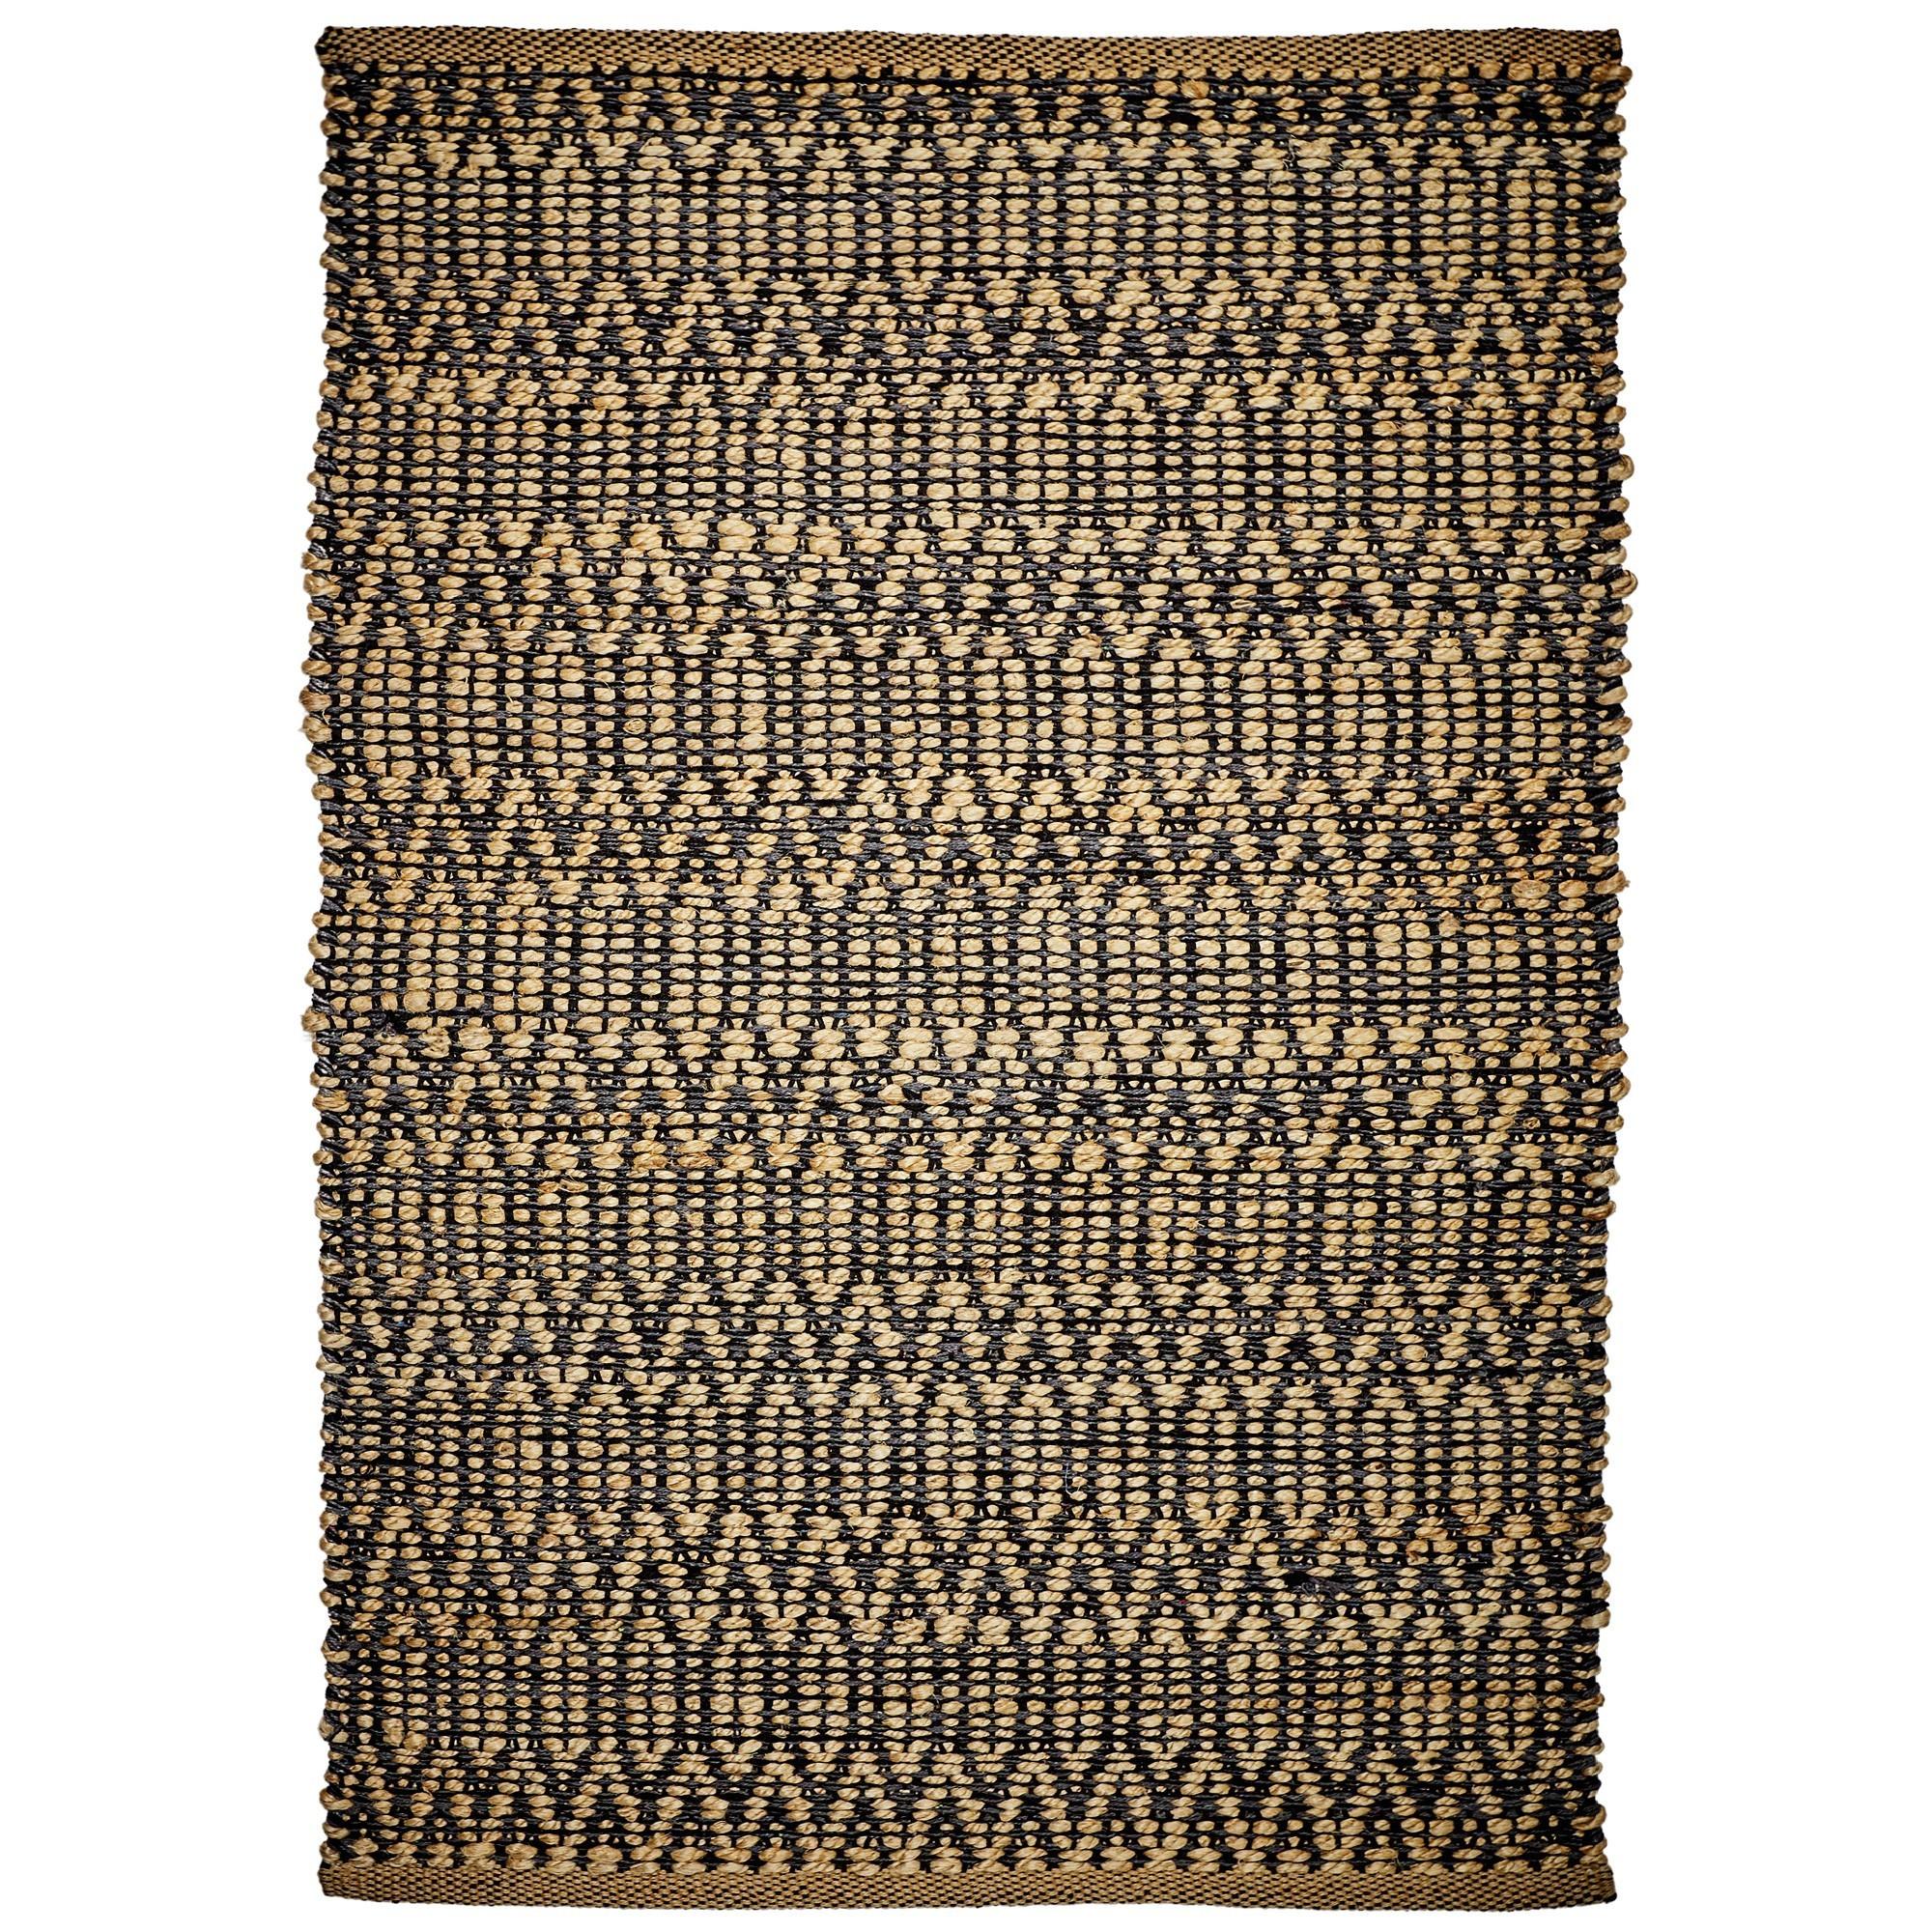 Minar Jute & Cotton Rug, 320x230cm, Black / Natural